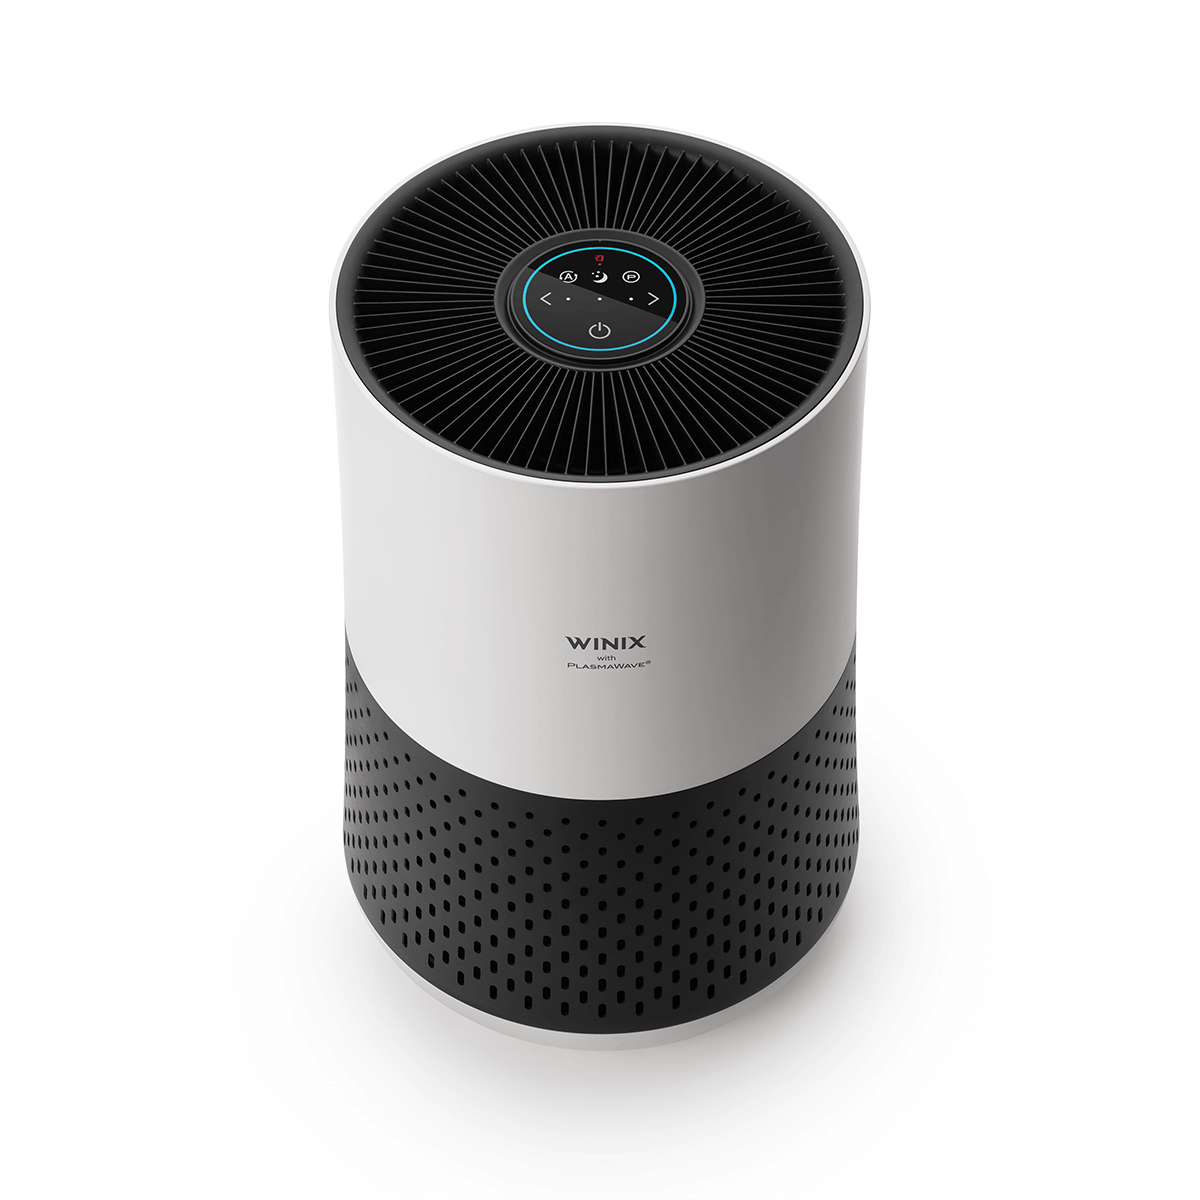 Winix zero compact hava temizleme cihazı üst